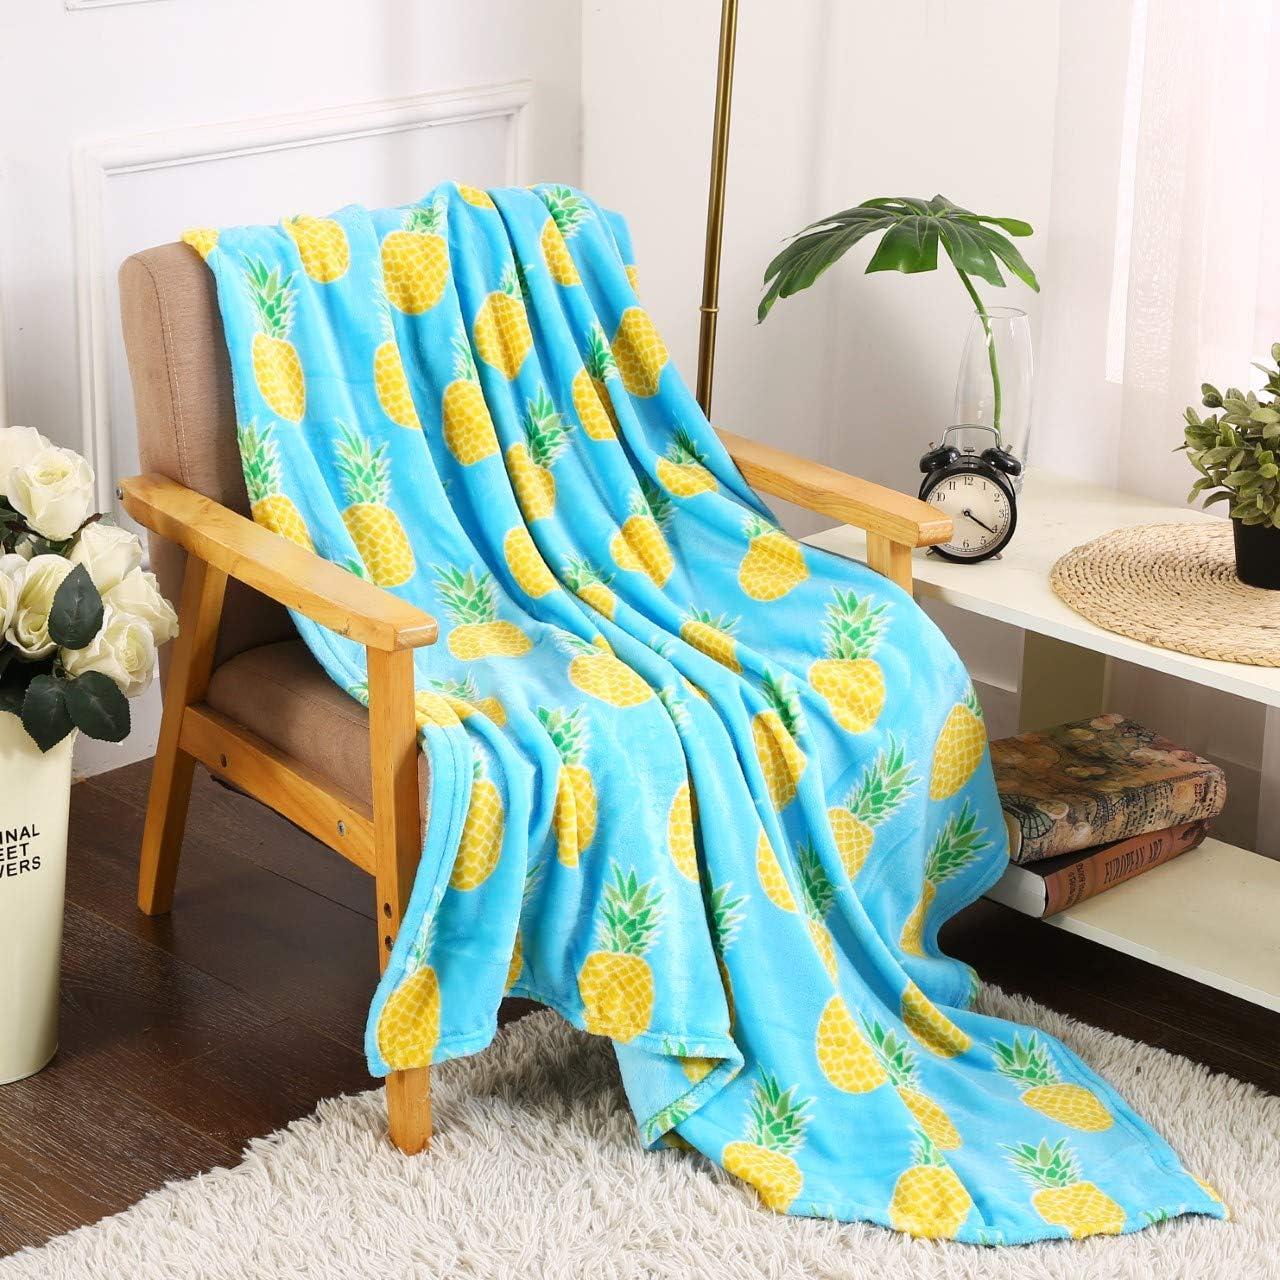 "Valerian Luxury Velvet Touch Ultra Plush Christmas Blanket |Soft, Warm, Cozy |Holiday Printed Fleece Throw/Blanket - 50"" x 60inch (XSN-Holiday-Throw-Pickup Truck)"